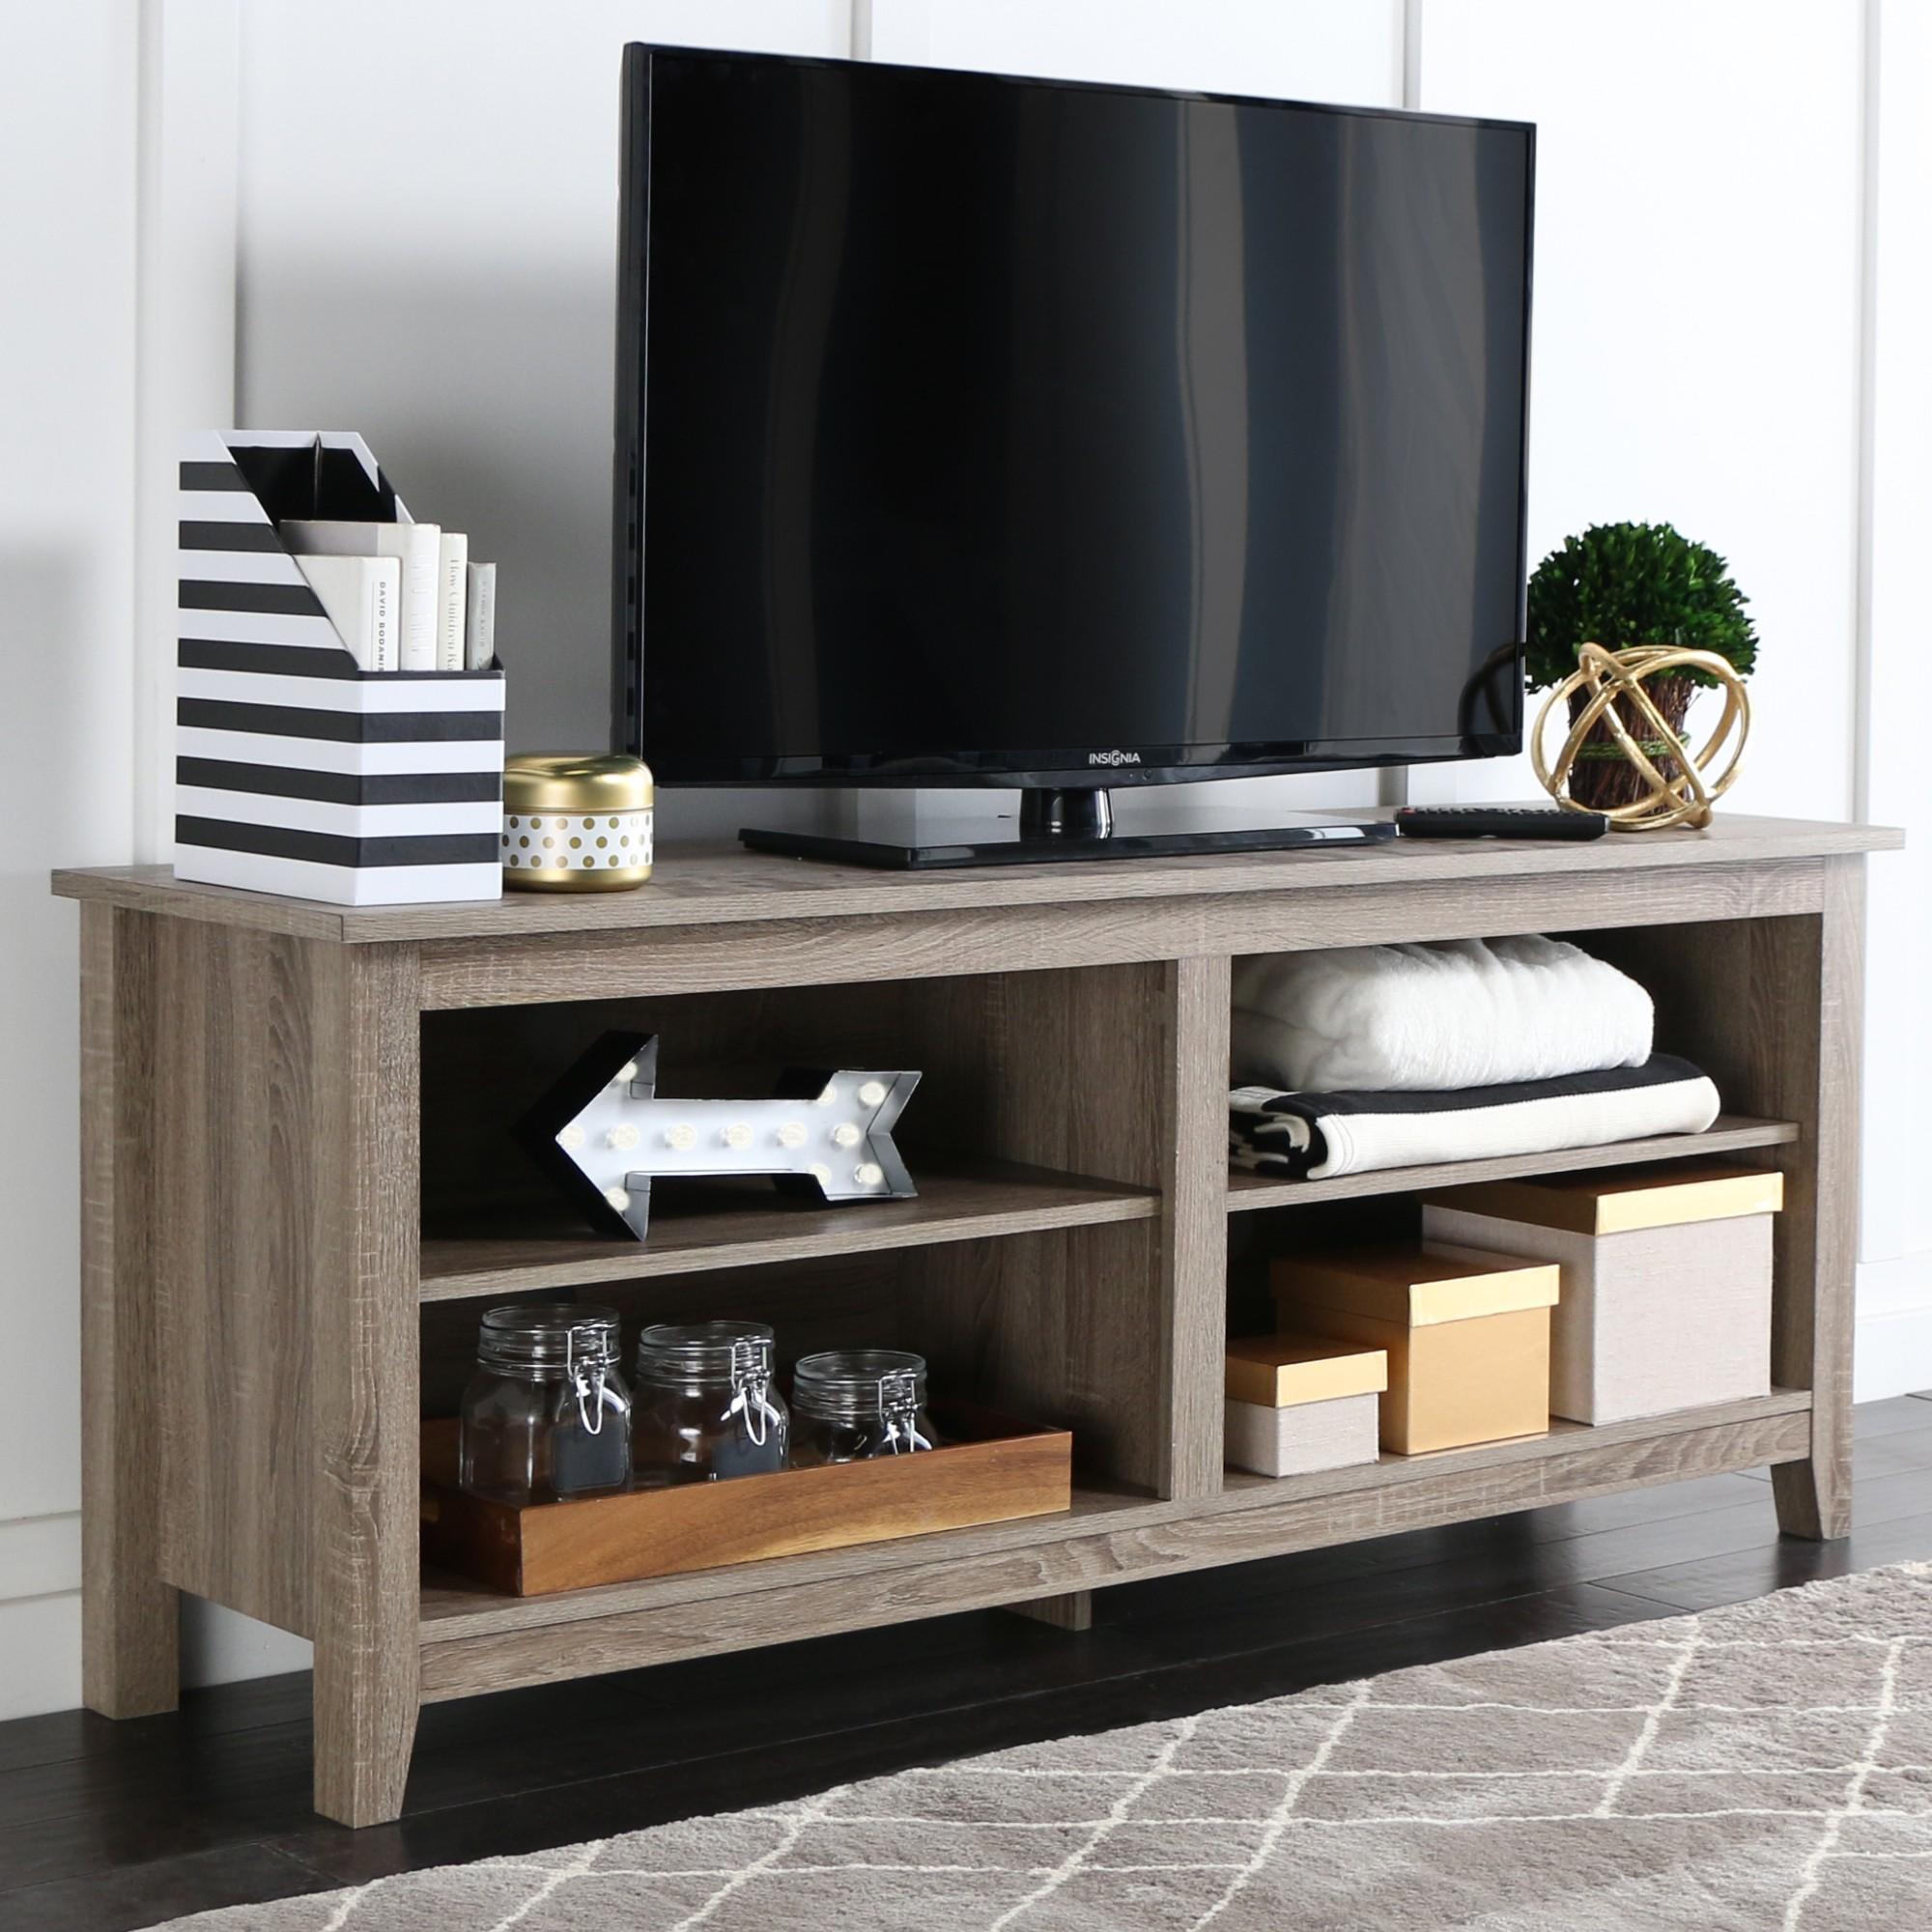 58 Wood Tv Media Stand Storage Console Driftwood Saracina Home  # Meuble Tele Angle But